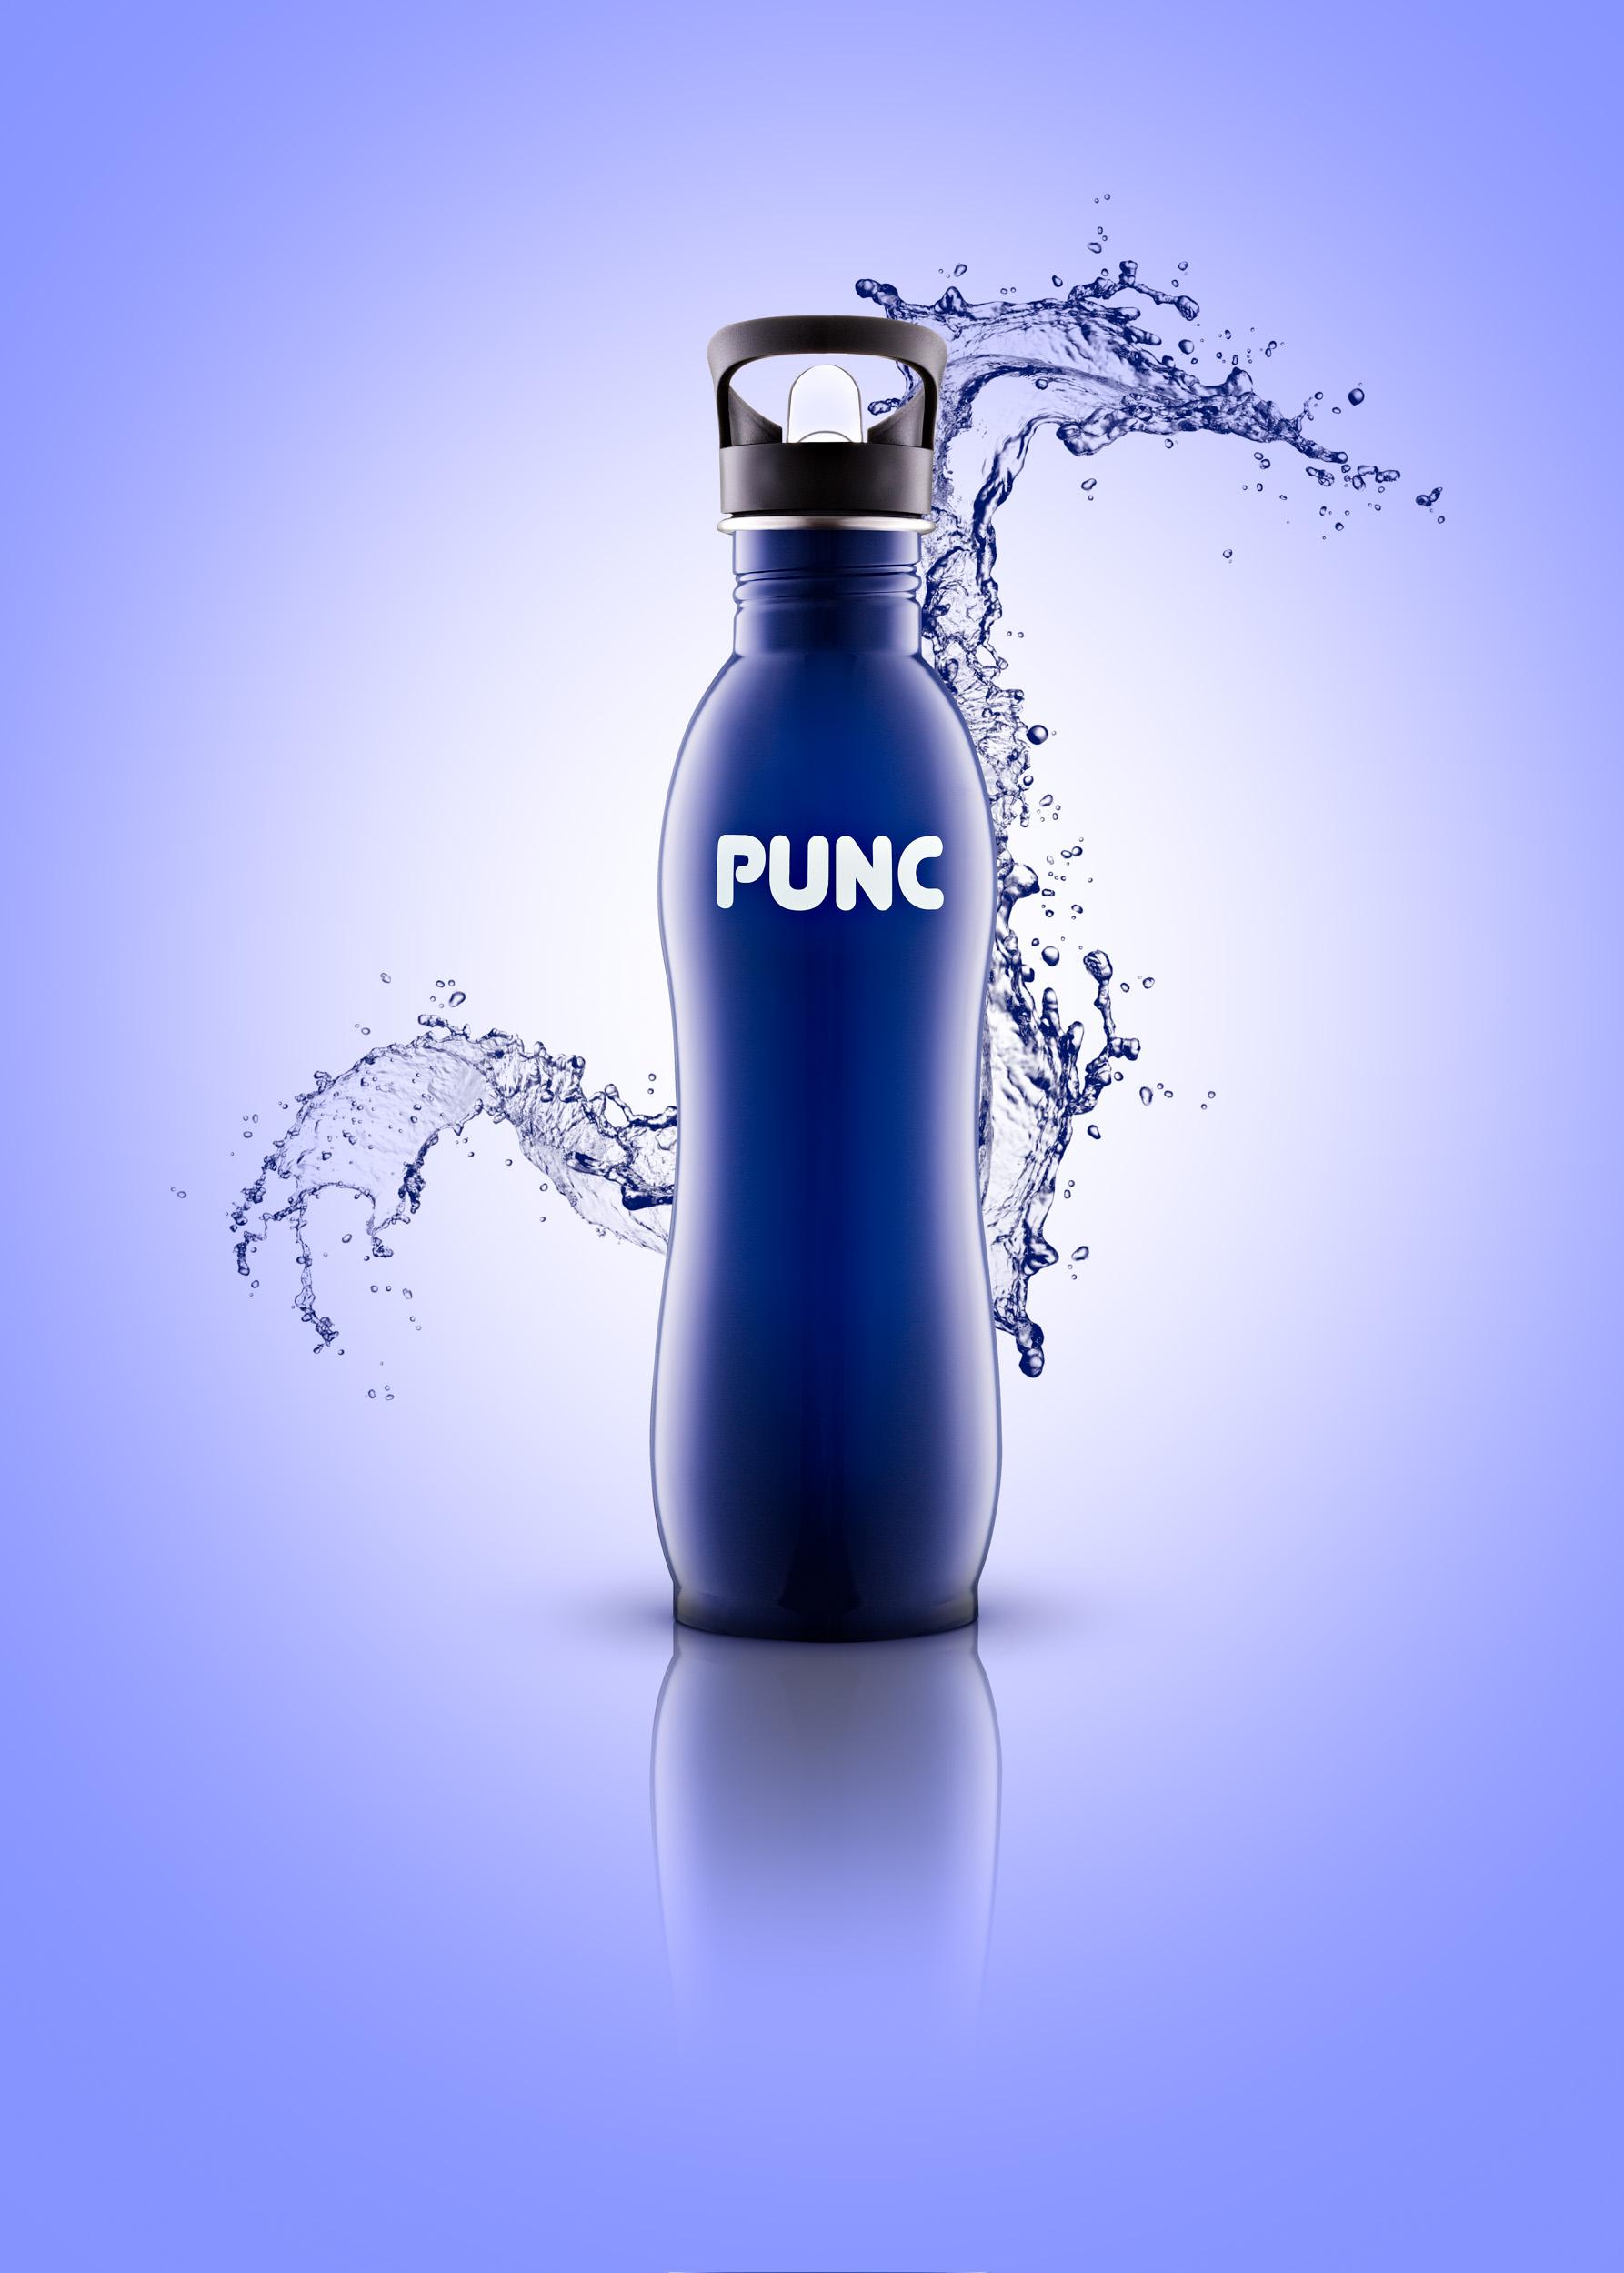 Neal Byrne Photography-Punc Bottle.jpg